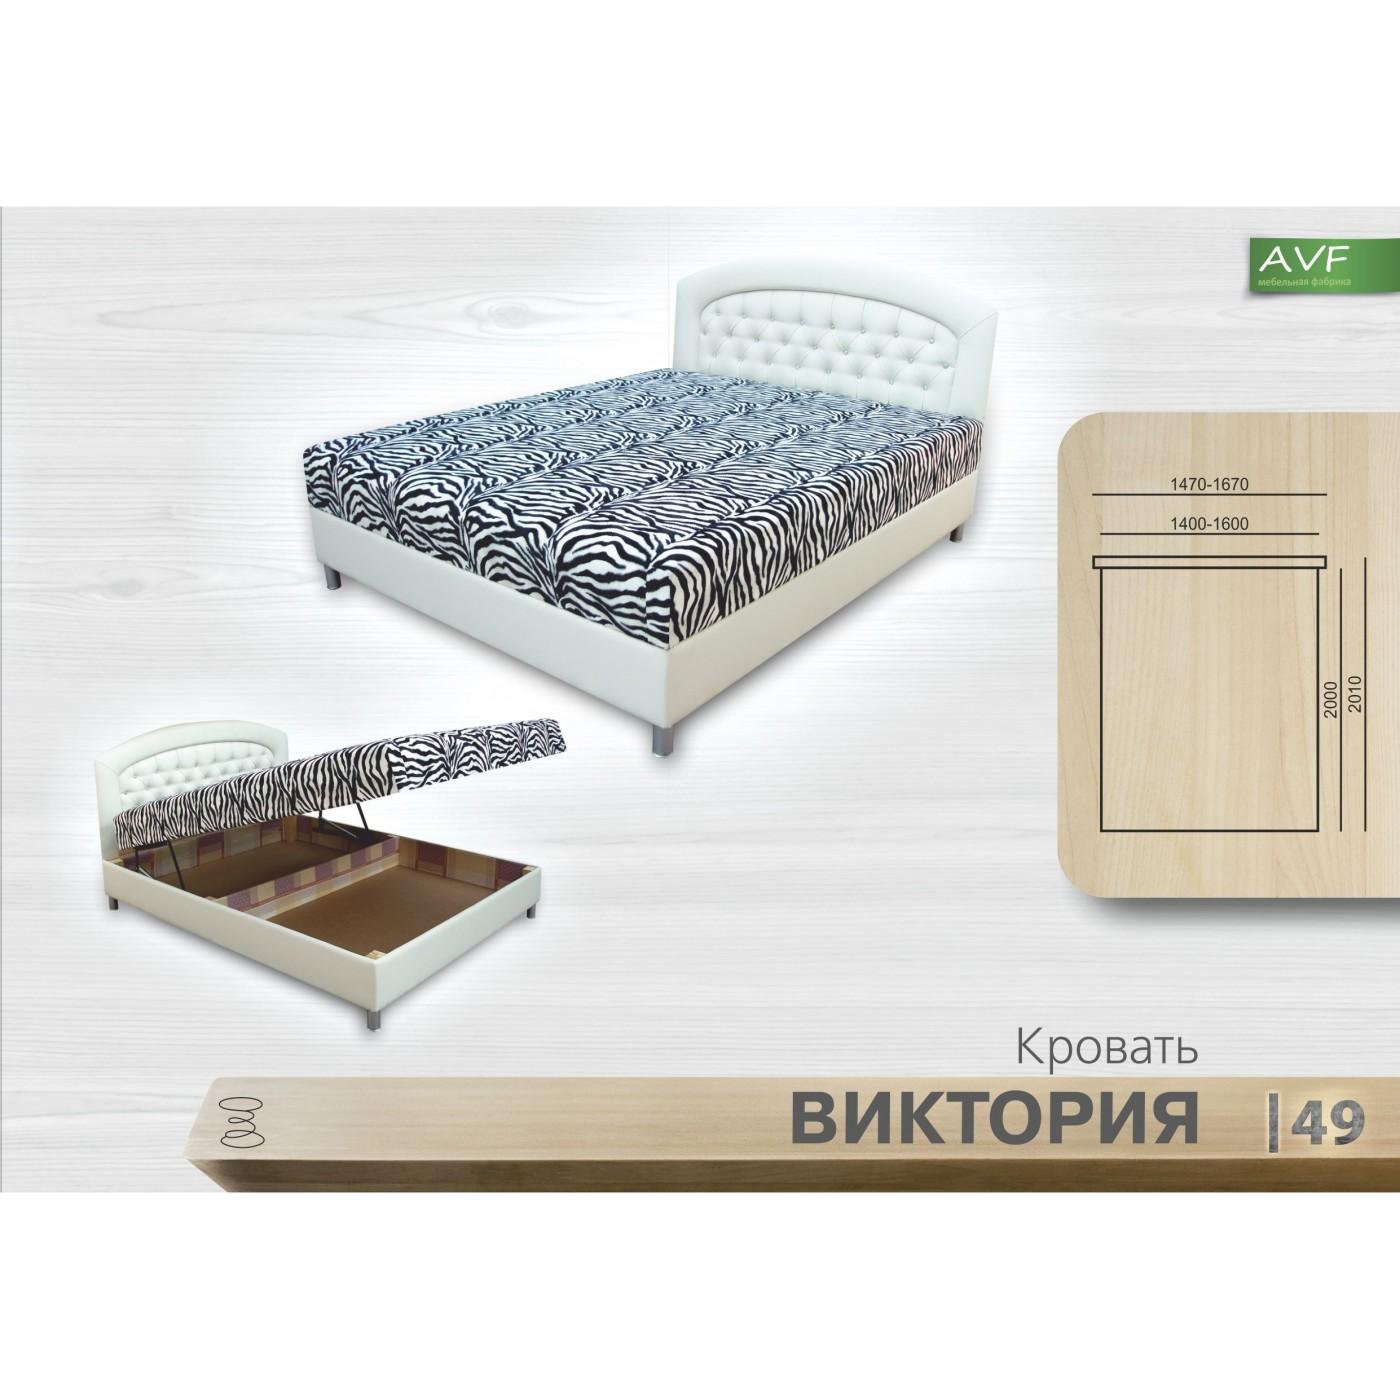 Кровать Виктория (1.6 , пр. бл. зевс, флай)